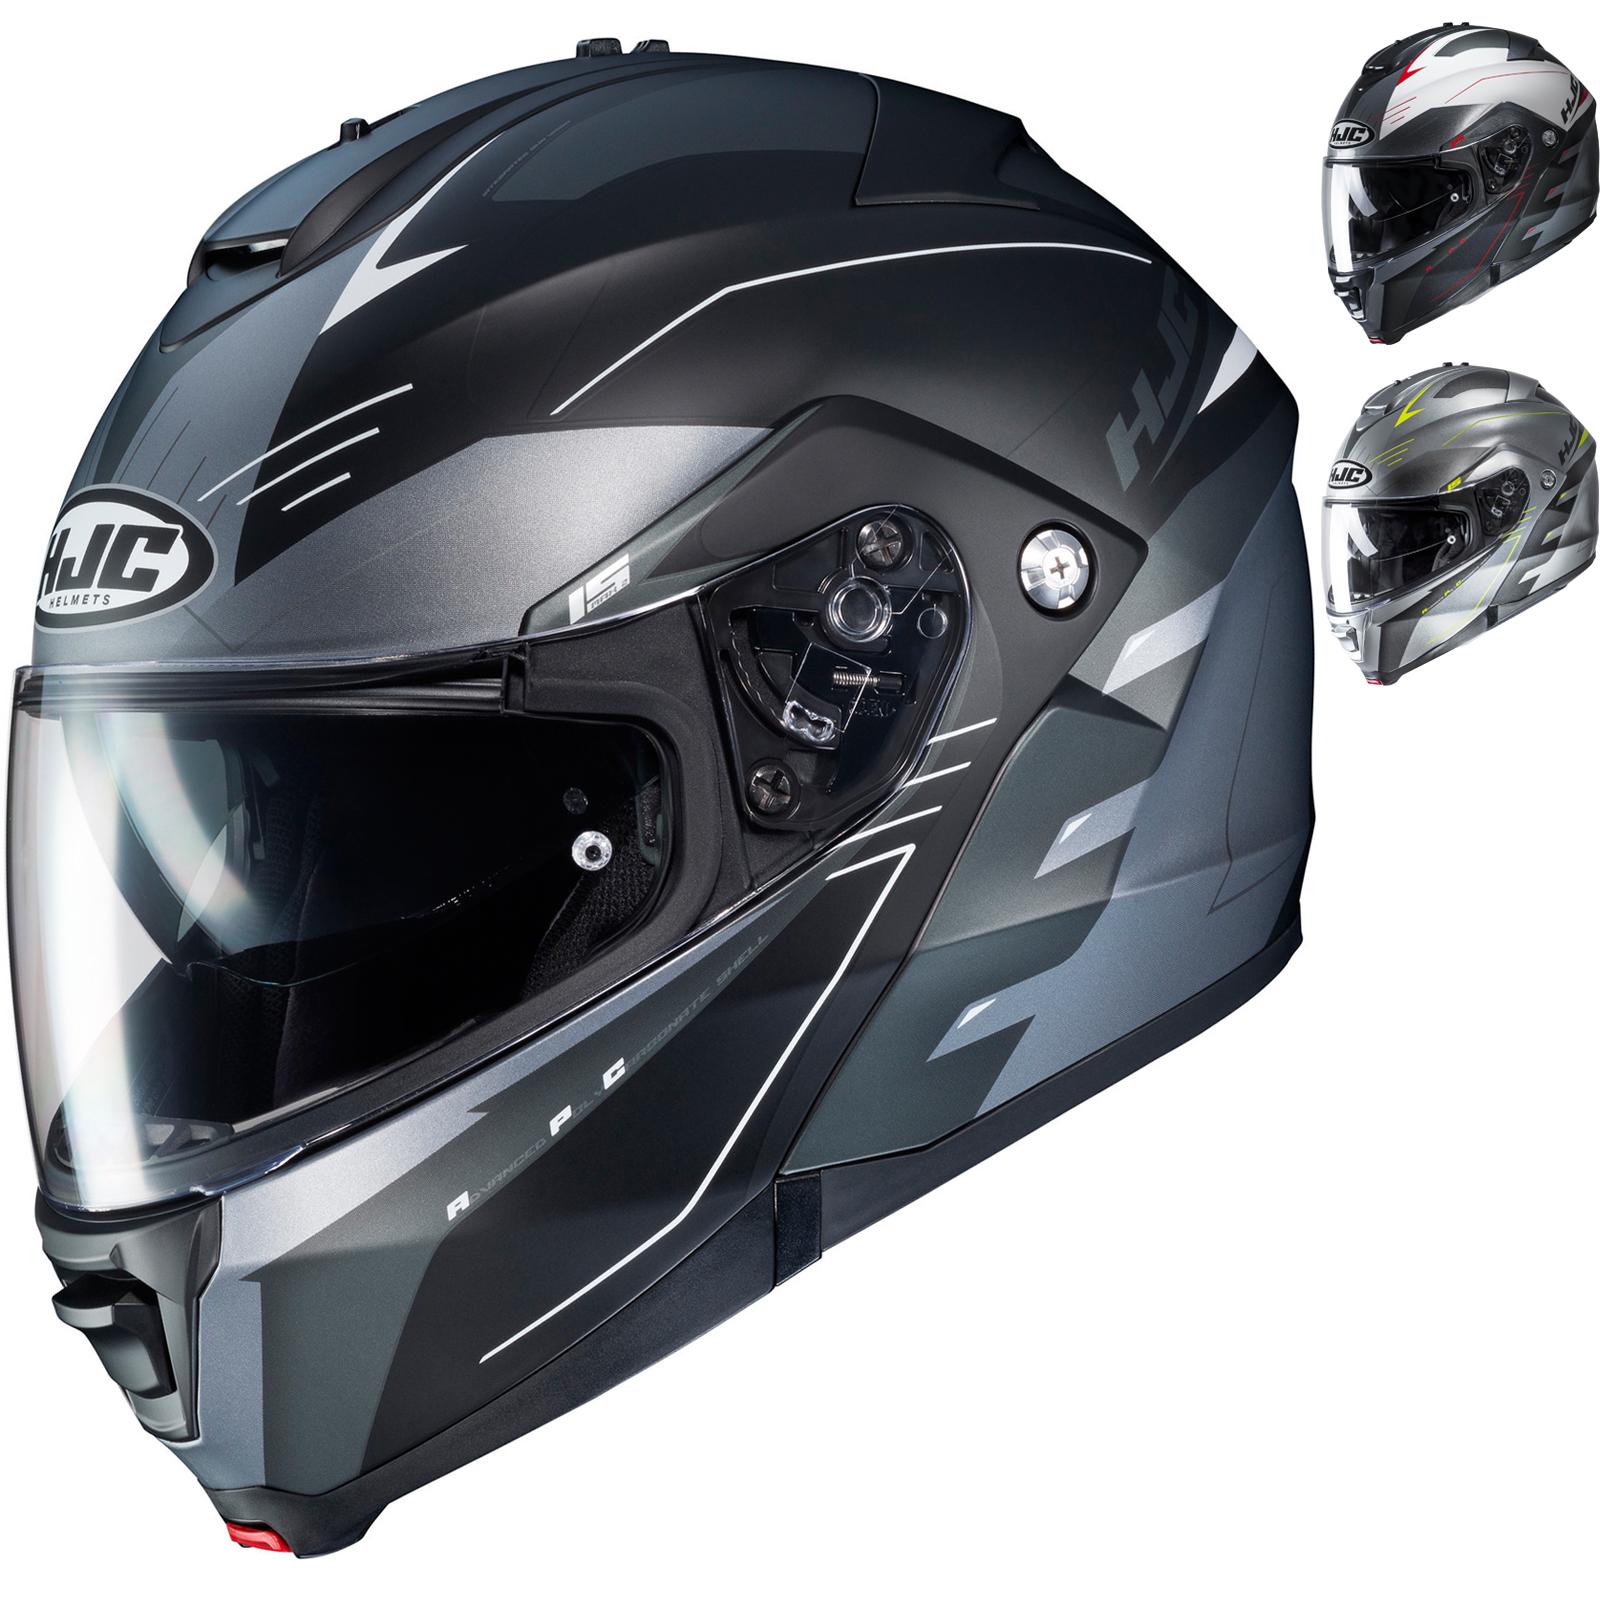 e9682af4 HJC IS-MAX II Cormi Flip Front Motorcycle Helmet Bike Crash Lid with ...